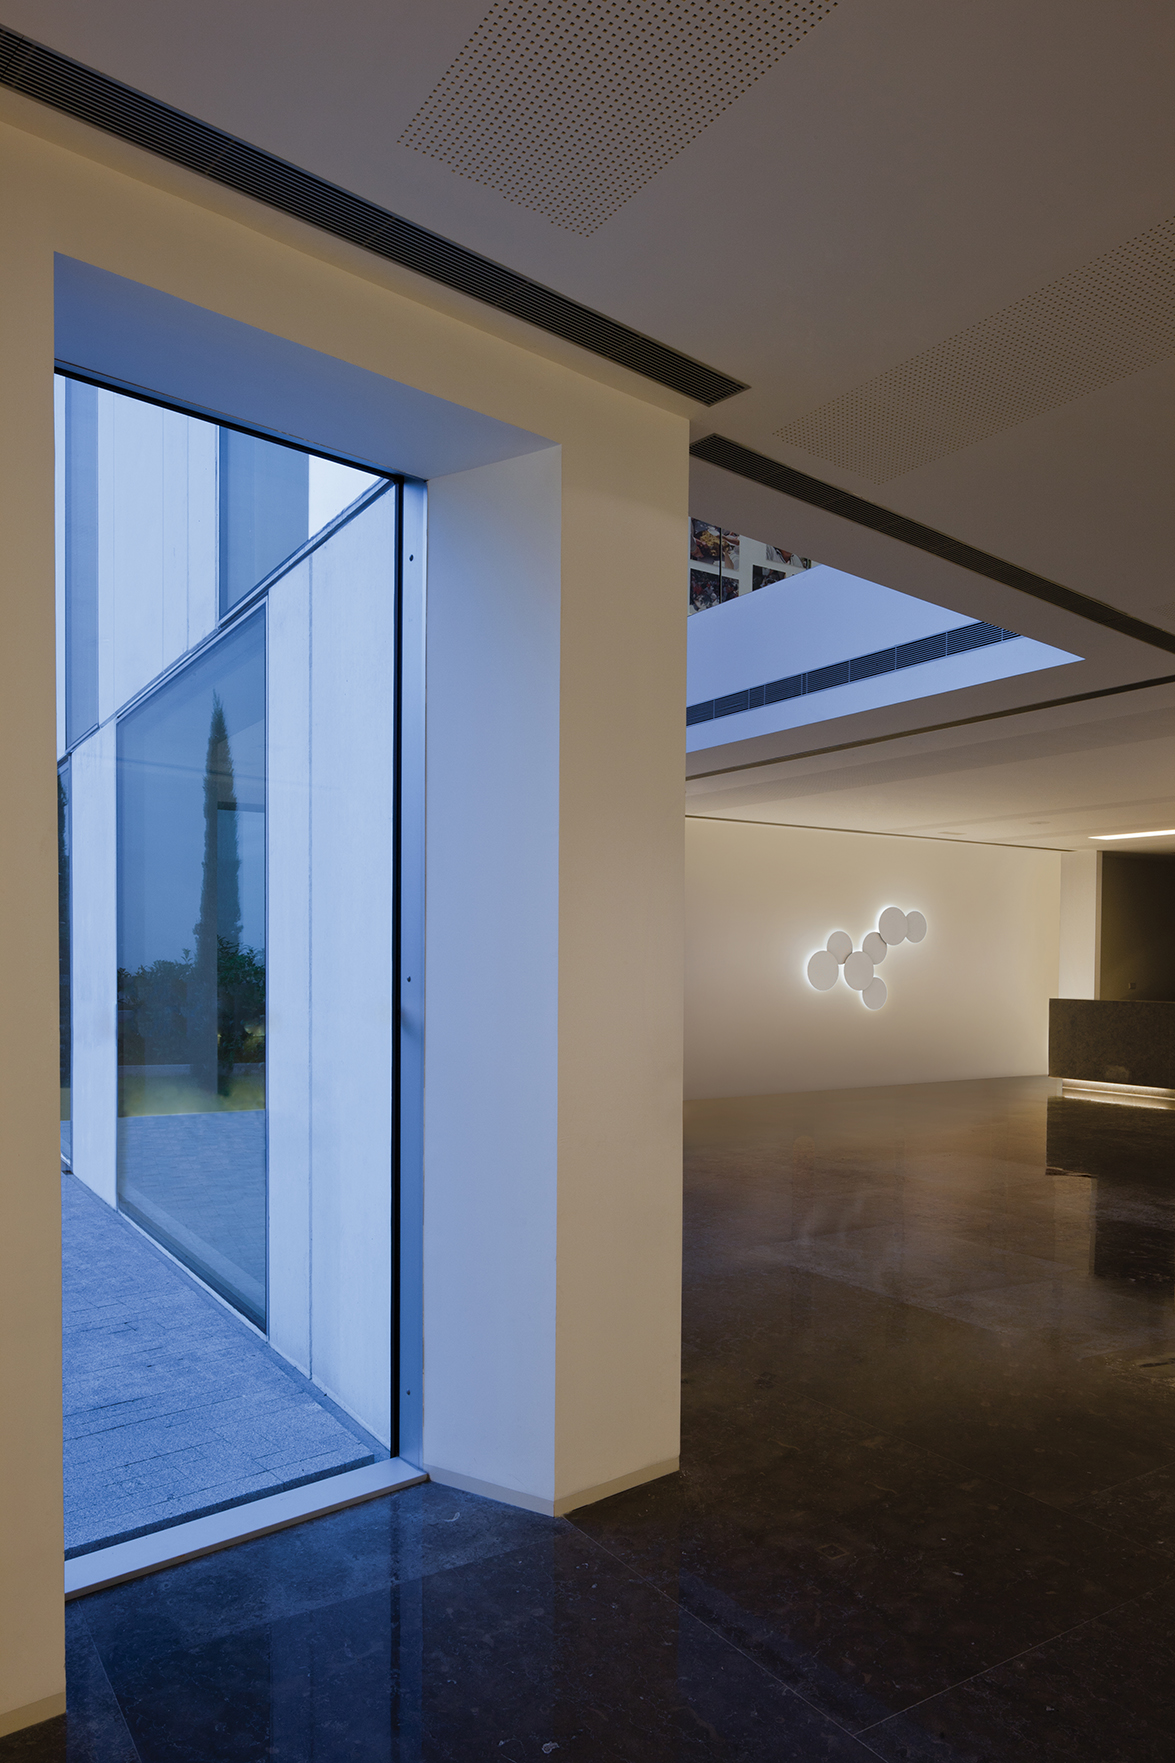 Puck Wall Art Design By Jordi Vilardell : Lighting keys for hotels corporate headquarters or public